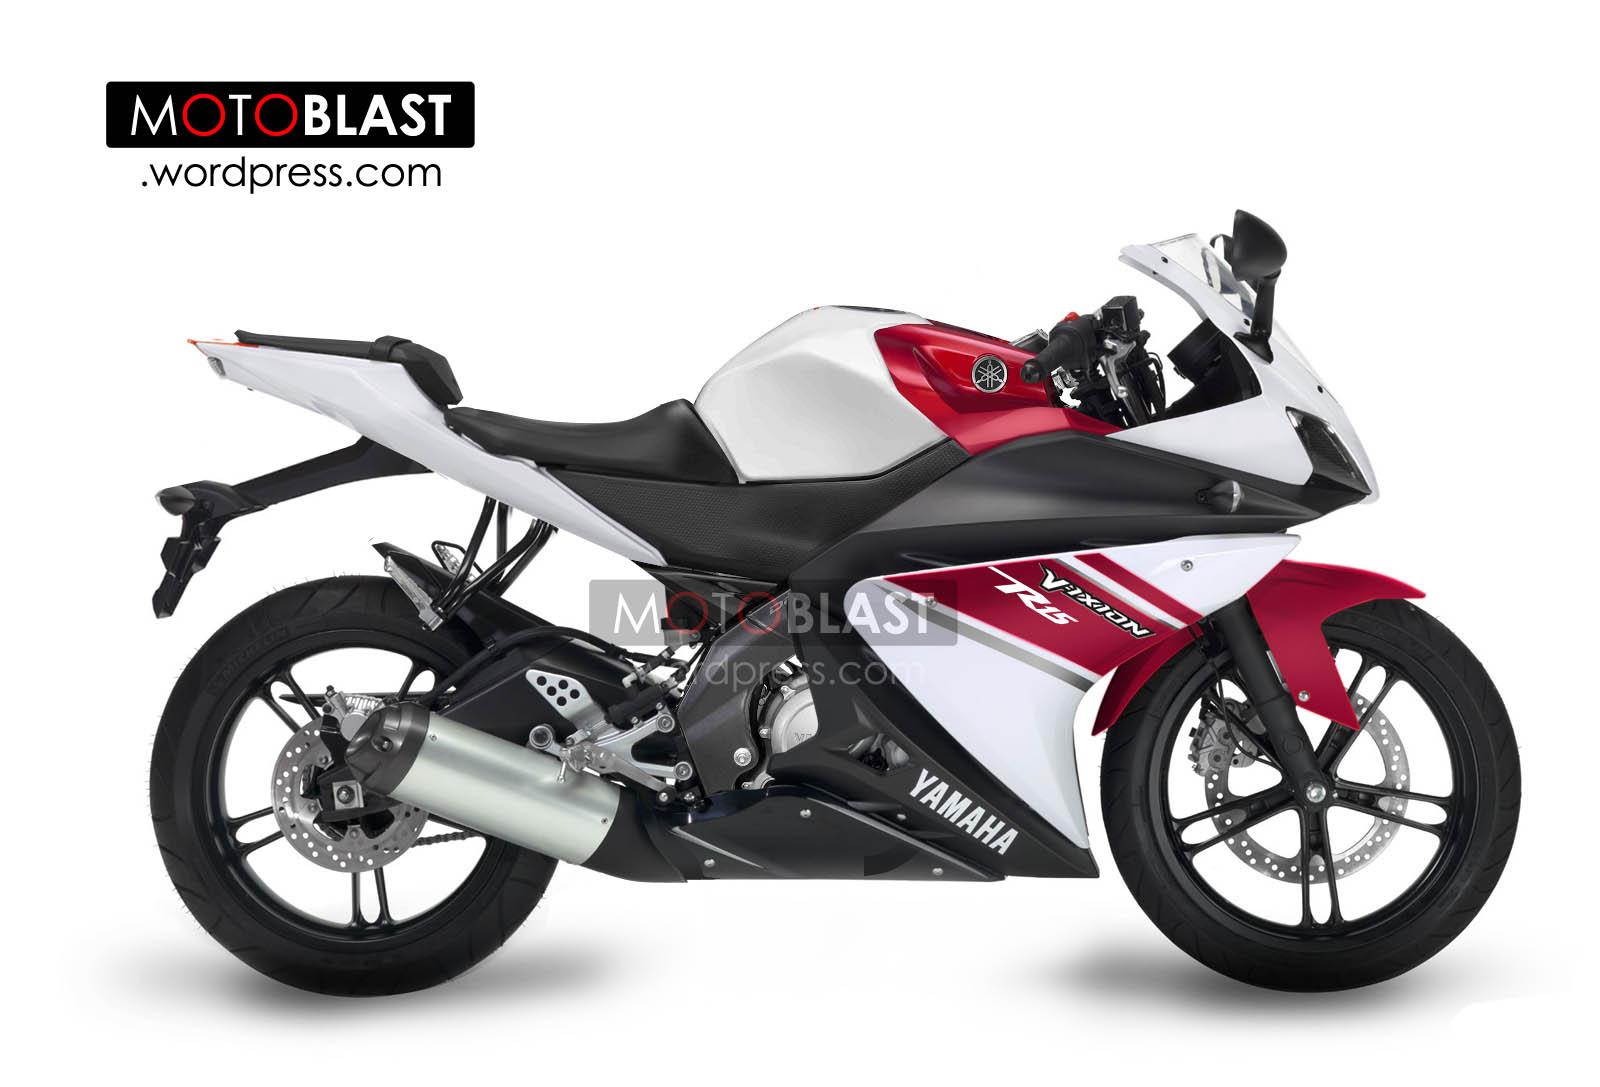 Penampakan Utuh Yamaha Vixion R15 Monyorr Monyoorr Versi